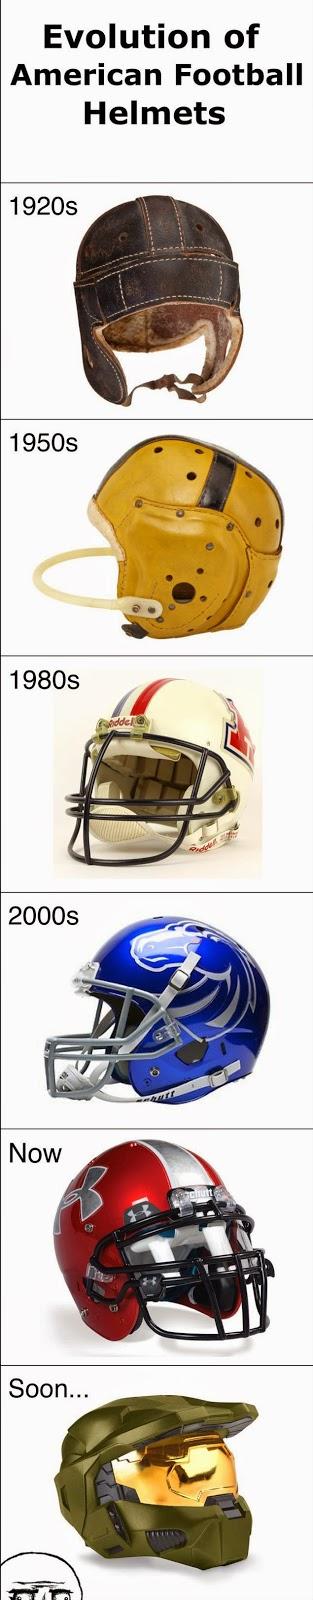 evolution of american football